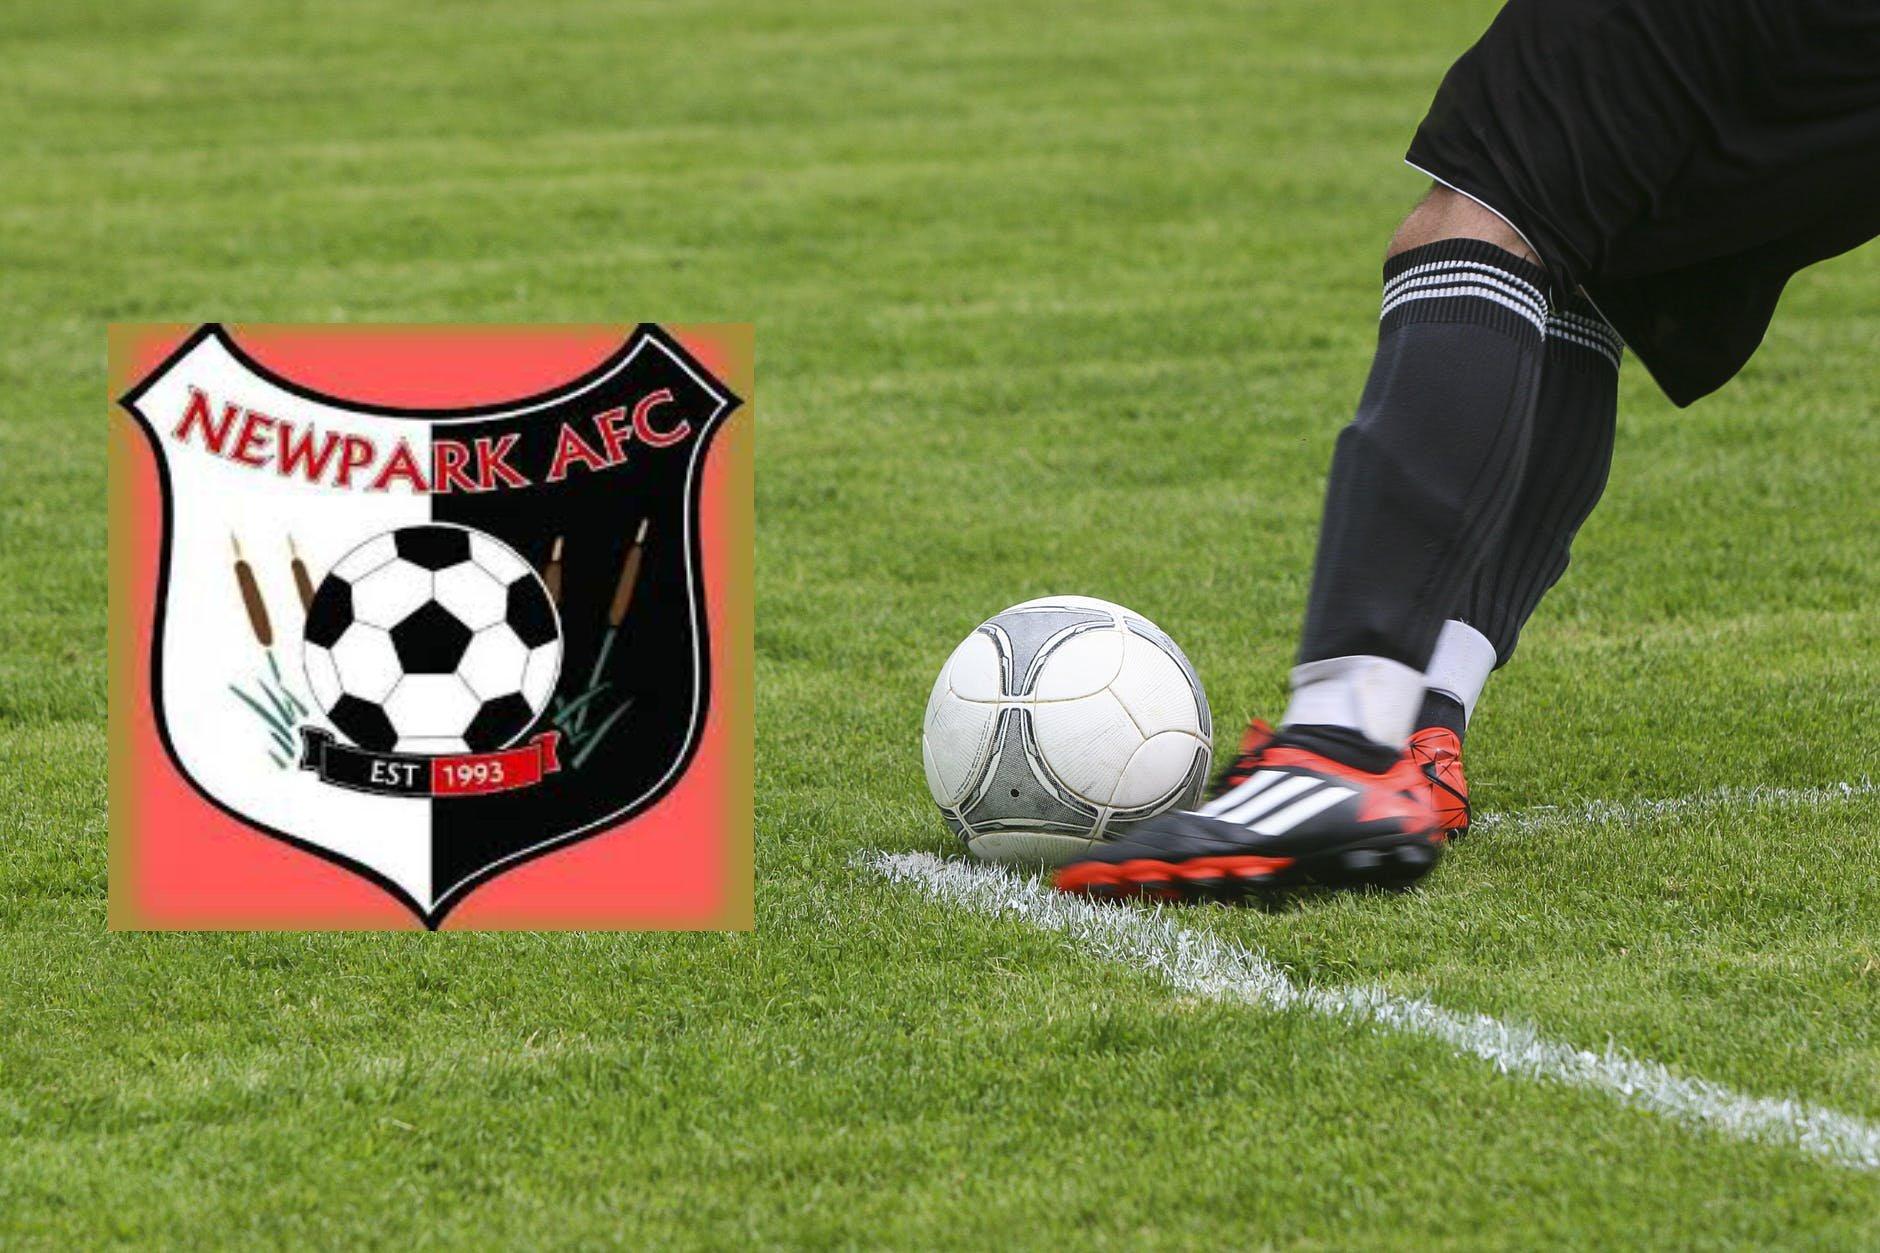 Newpark United